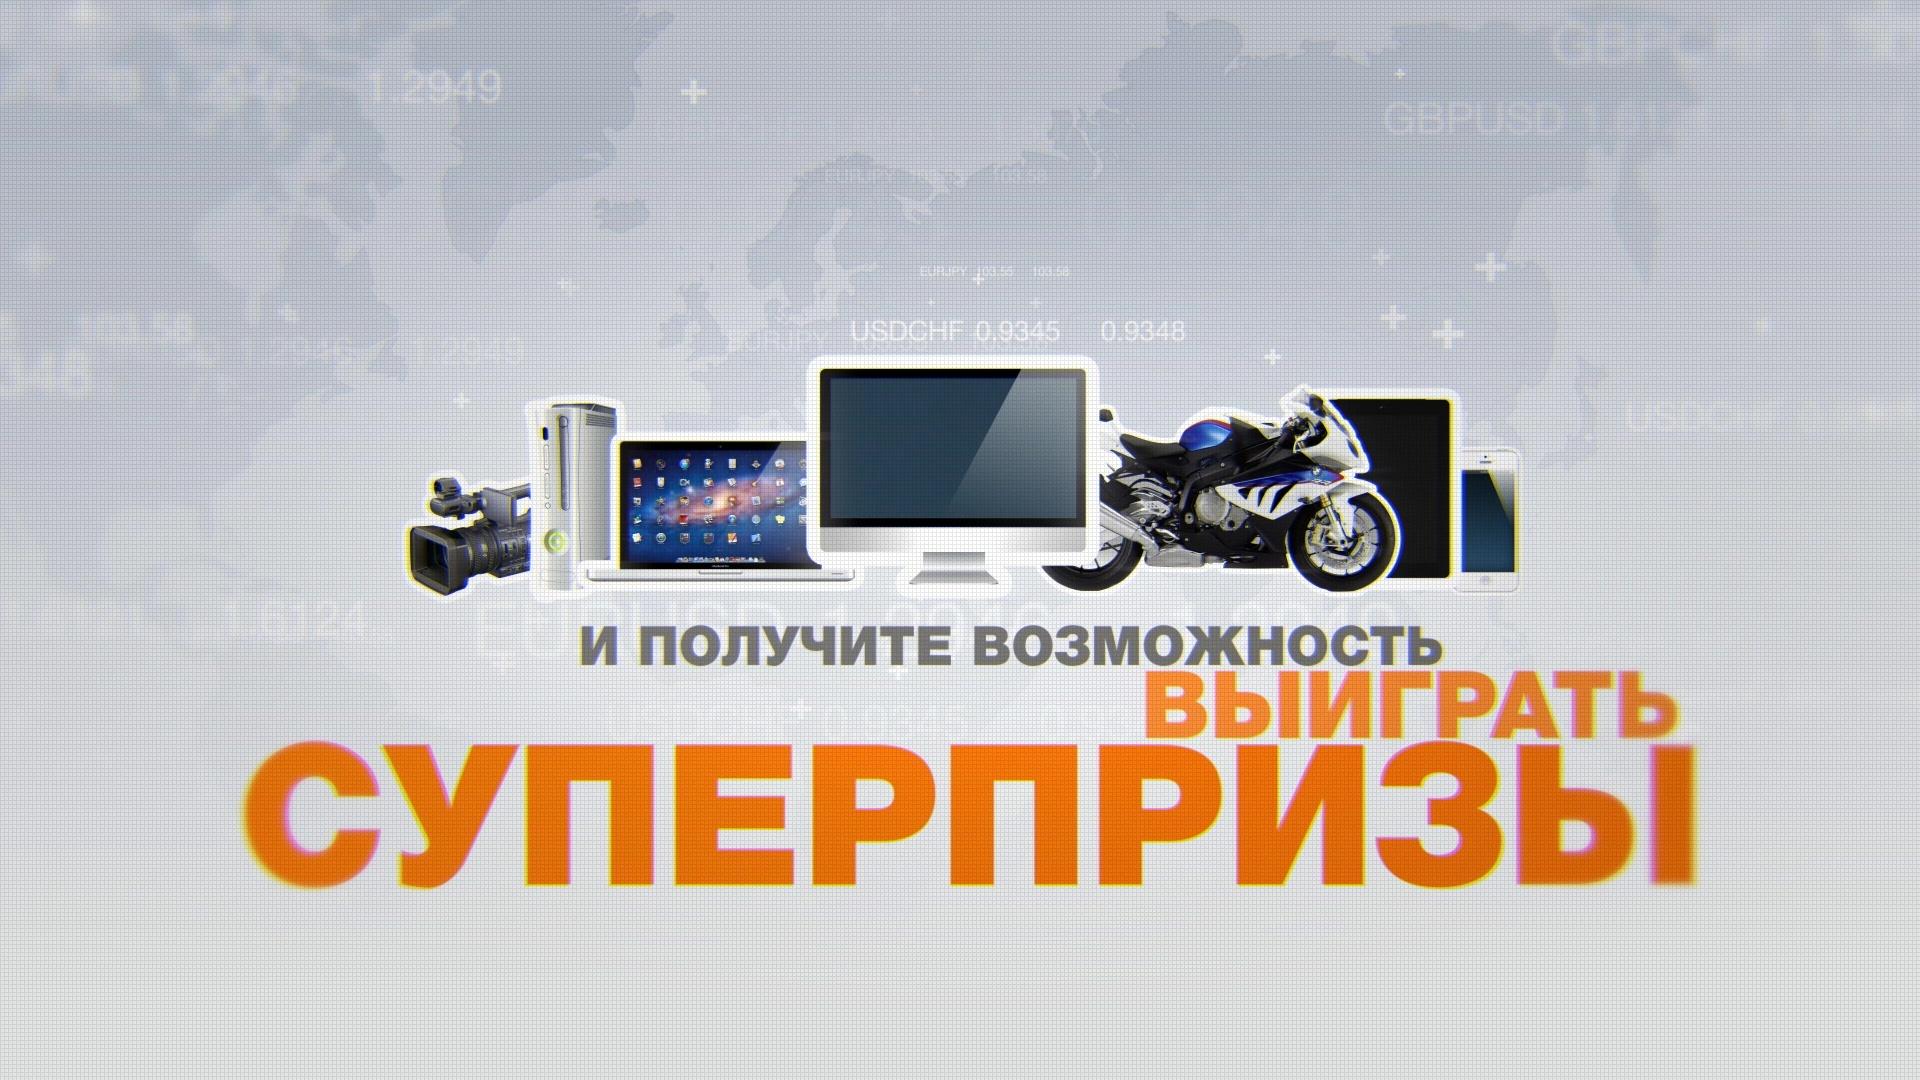 ams_2020-11-23-06h45m48s274